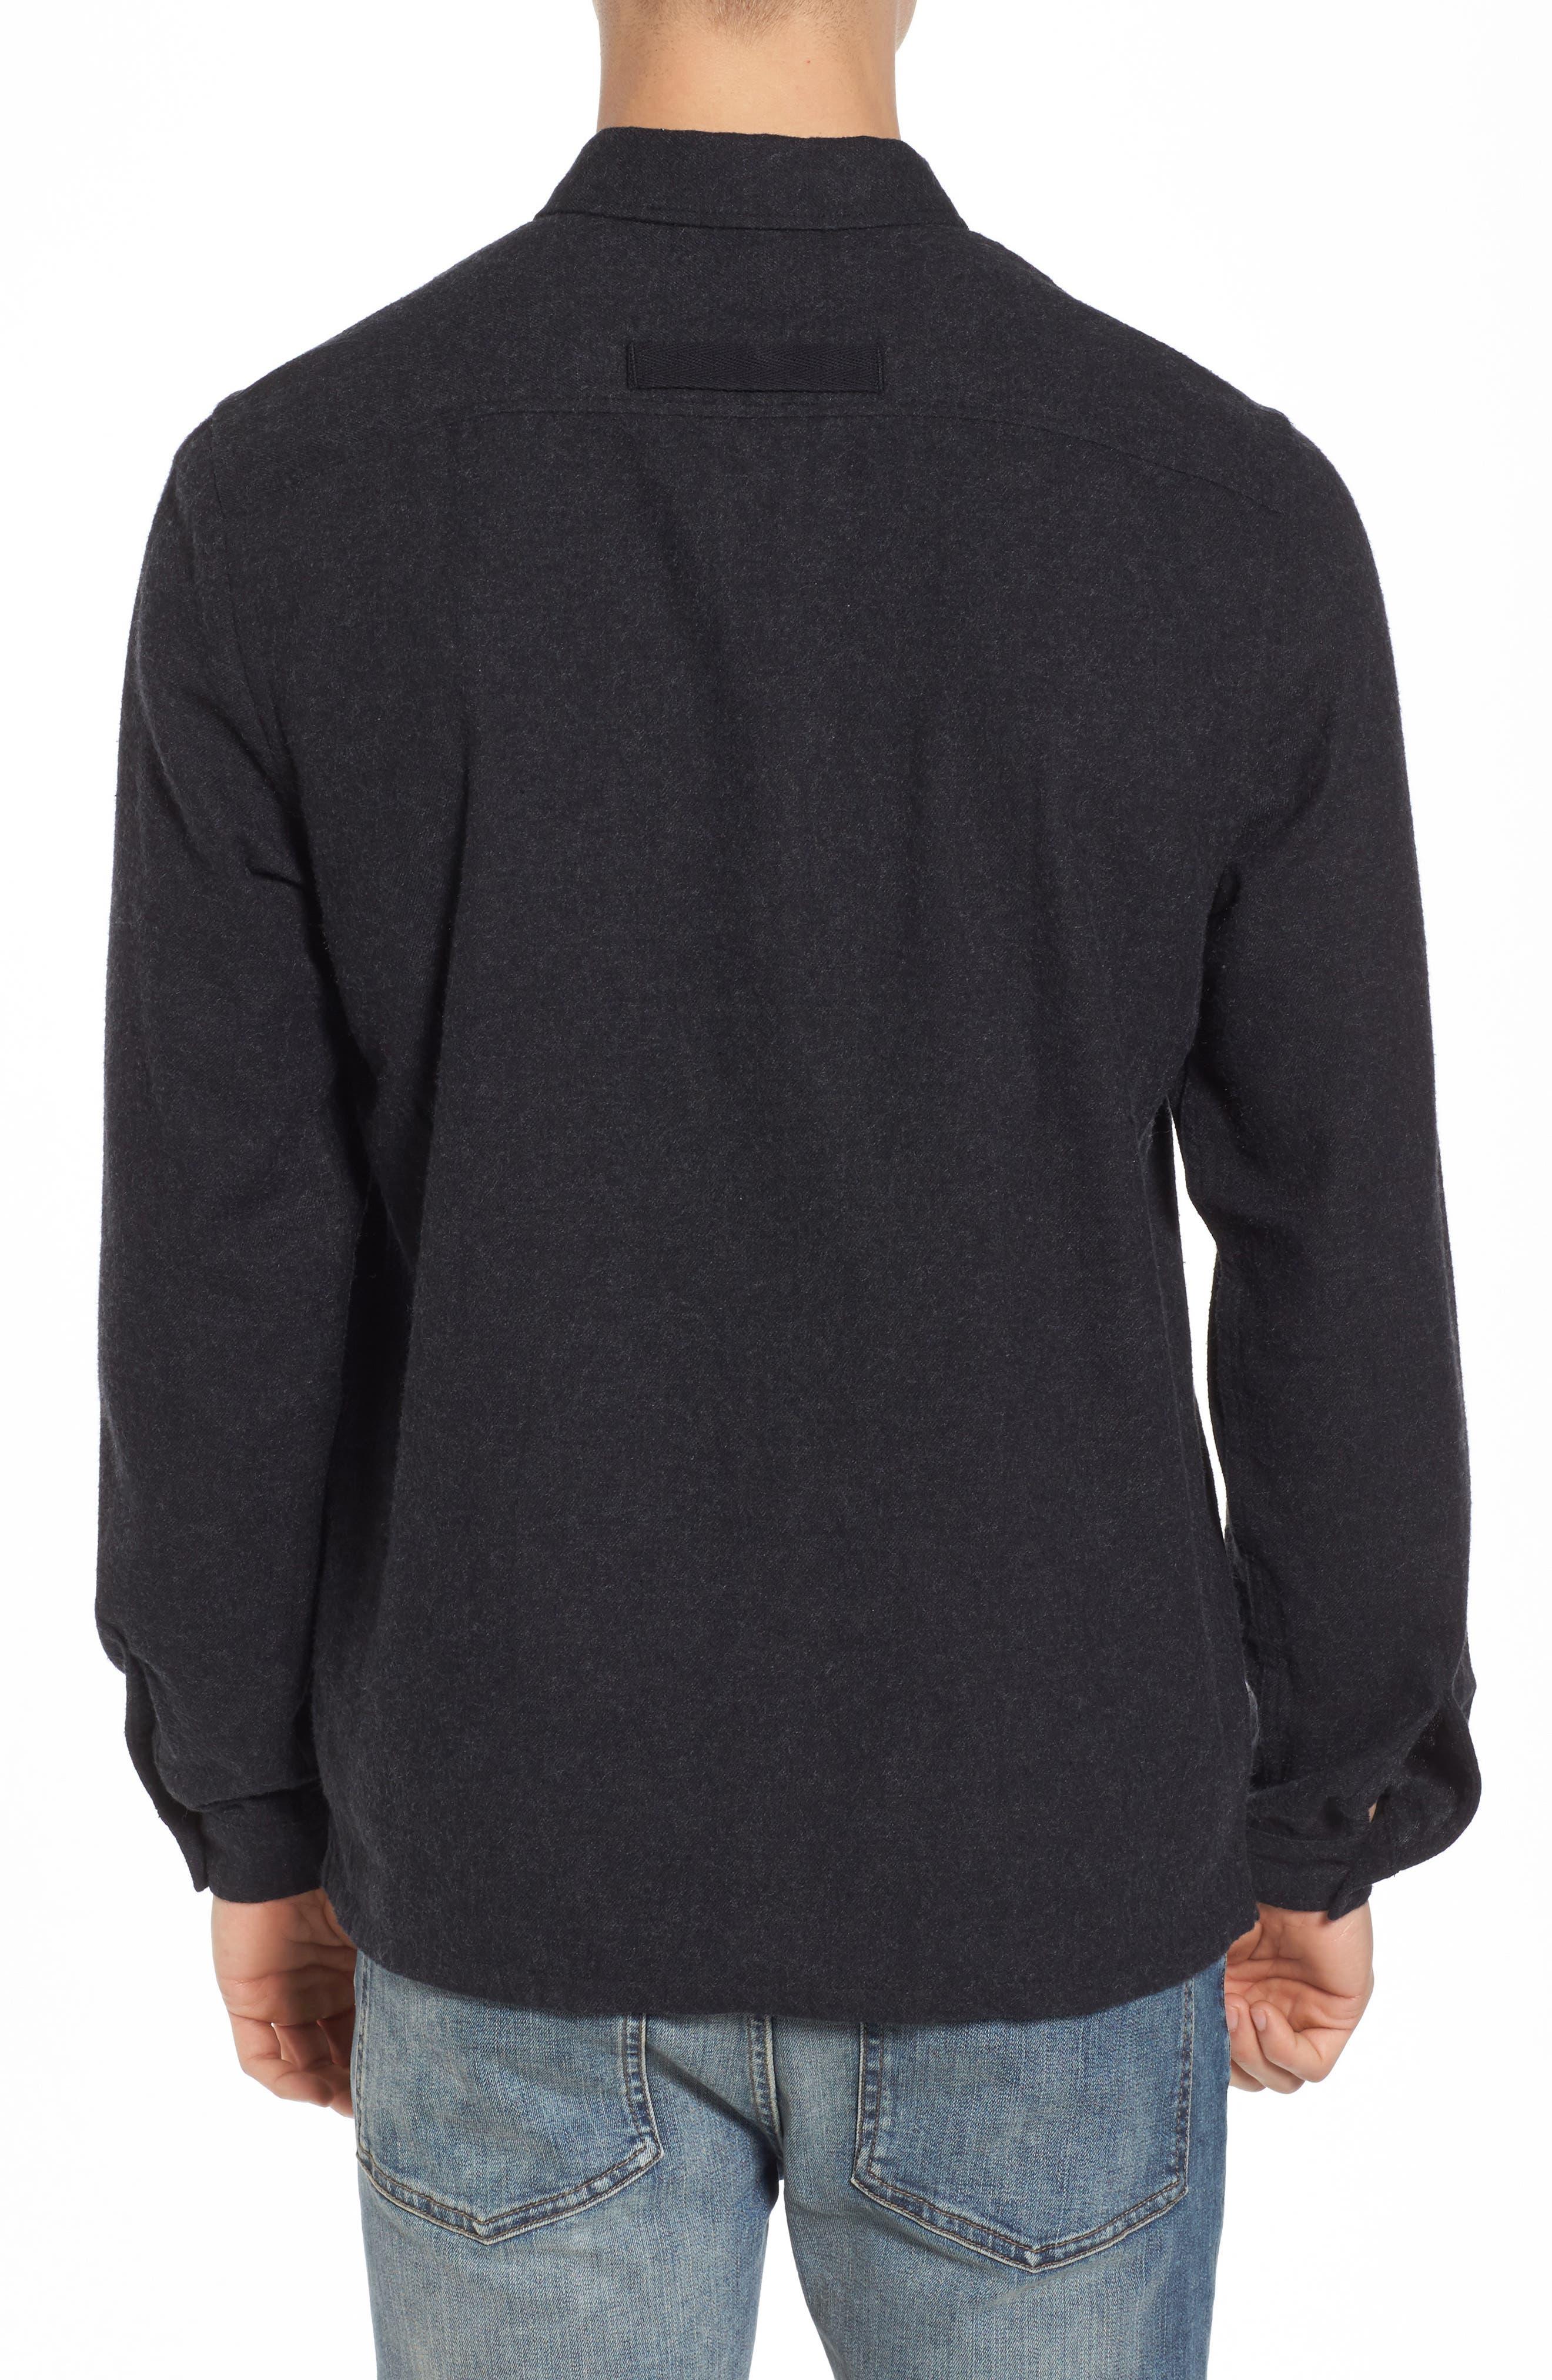 Nicks Flannel Zip Overshirt,                             Alternate thumbnail 2, color,                             001